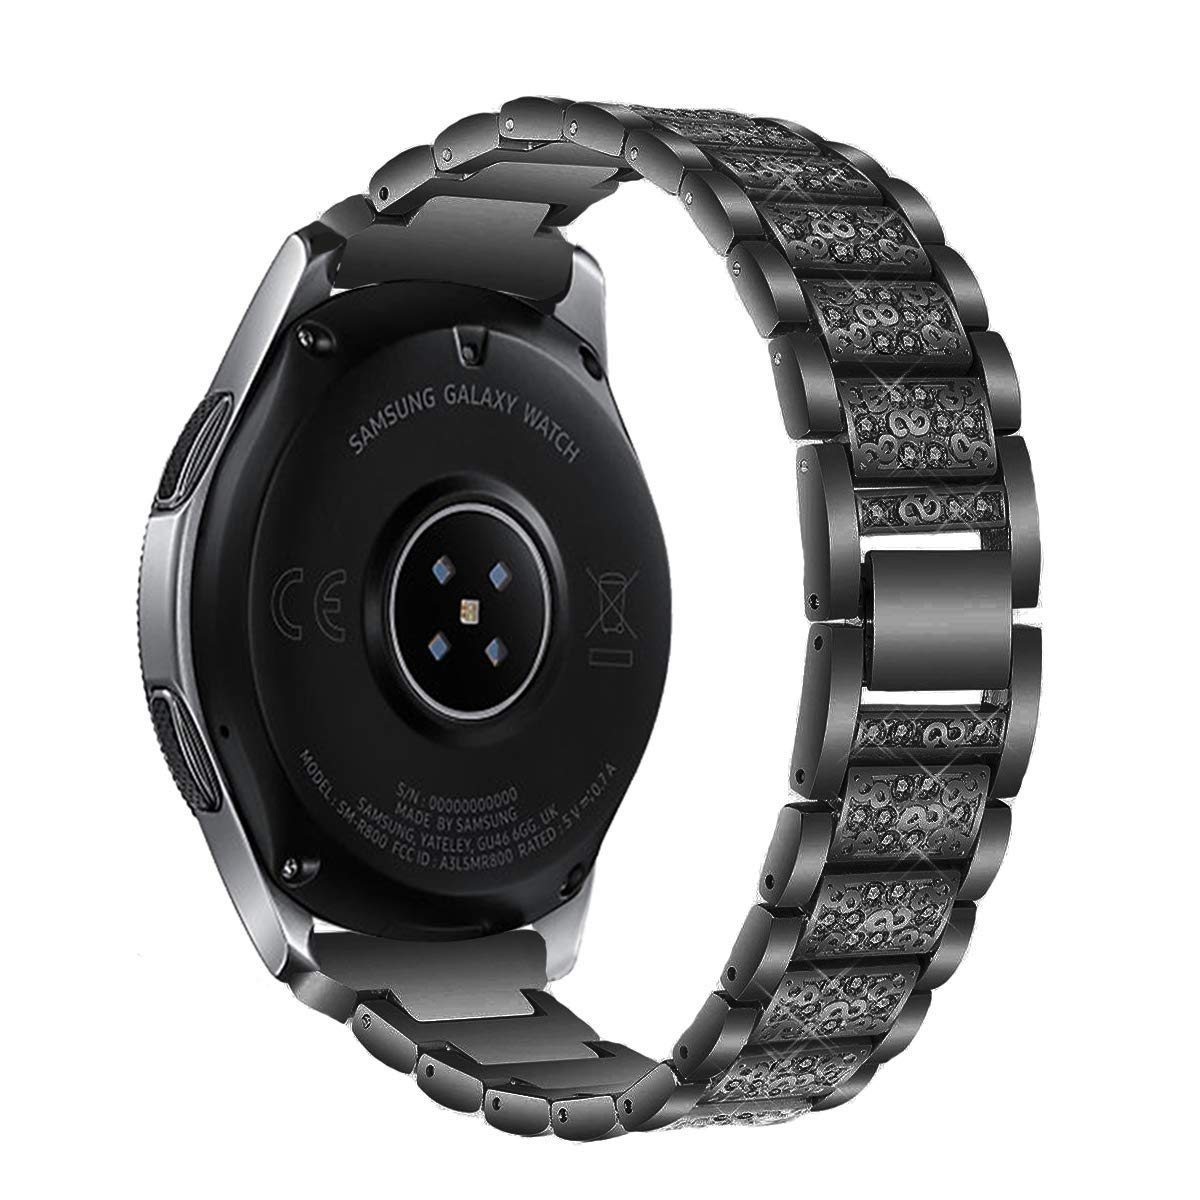 Kartice Compatible Samsung Galaxy Watch(46mm) Bands,22mm Galaxy Watch Band Alloy Crystal Rhinestone Diamon Replacement Bracelet Strap fit Samsung Galaxy Watch SM-800 Smart Watch(46mm).-Black